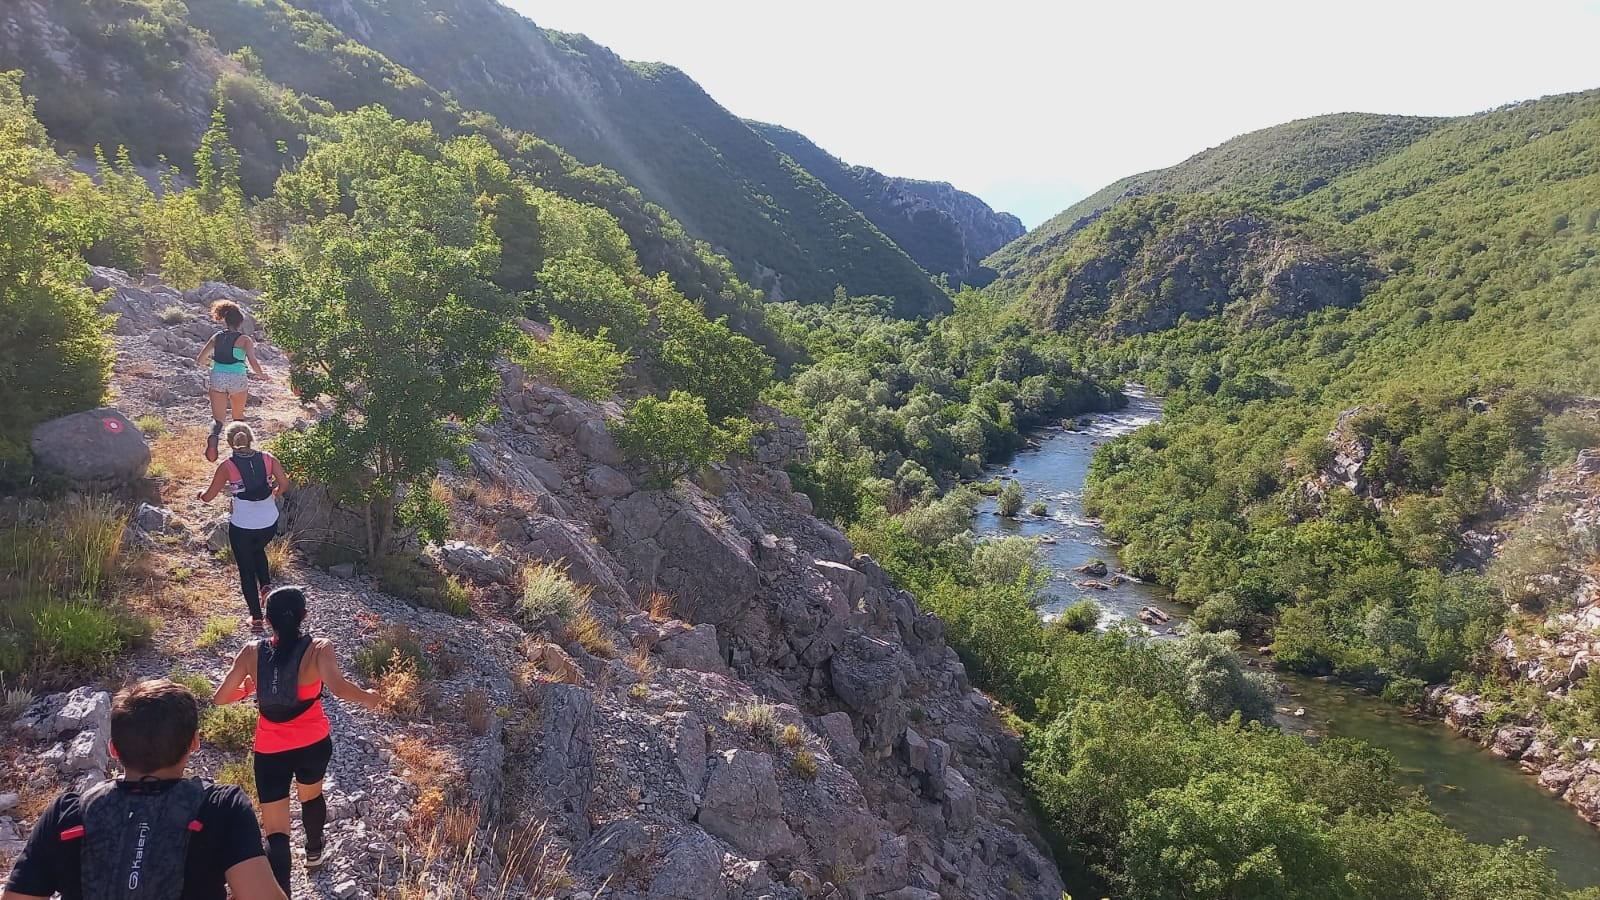 Trenutno pregledavate Kanjonom Cetine: Blato na Cetini – Nova Sela